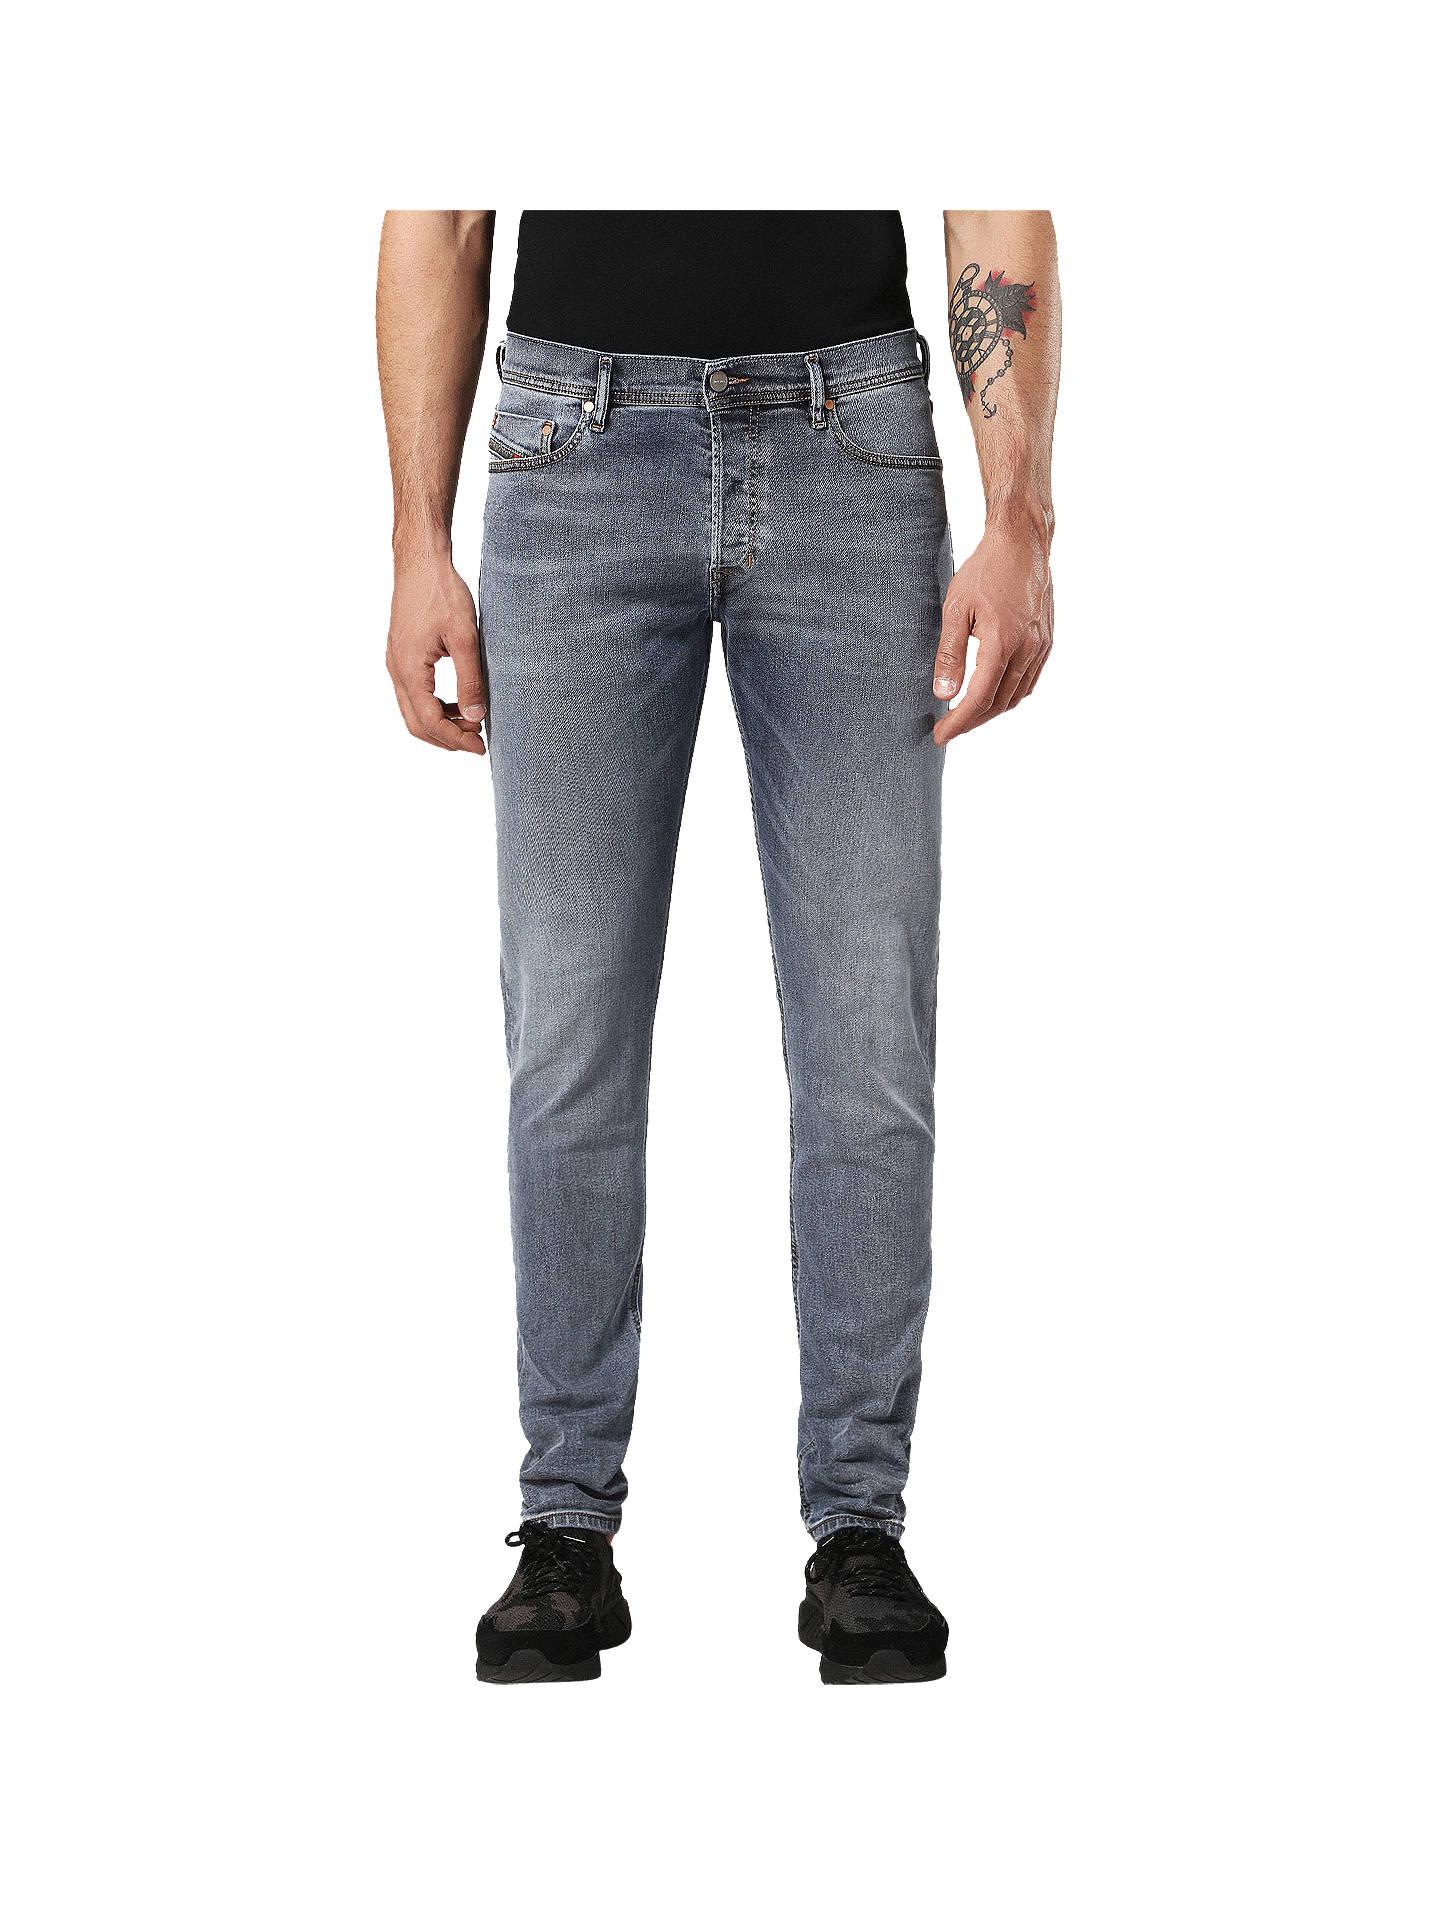 2353e7e1d2d3 Buy Diesel Tepphar 084QQ Carrot Slim Fit Jeans, Grey, 30S Online at  johnlewis.